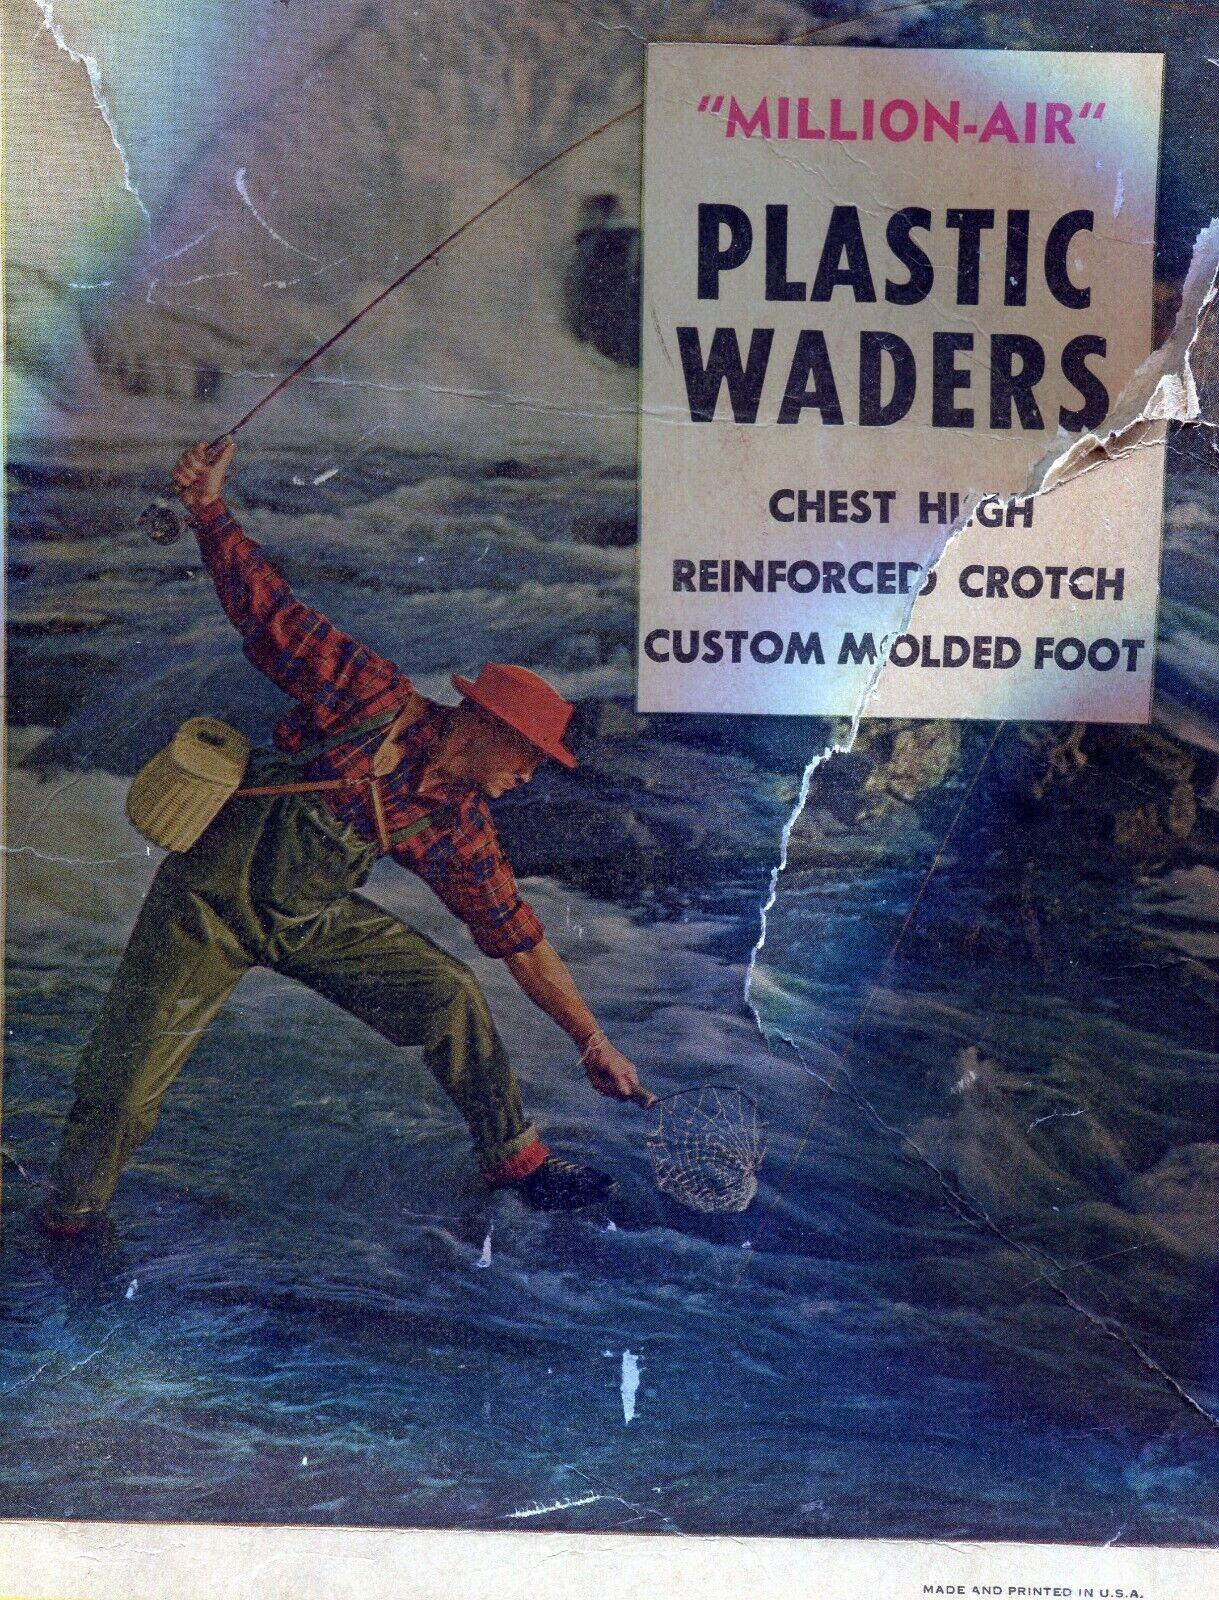 Vintage Millionair Plastic Chest Waders Vinylite Plastics Medium 810 scarpe Dimensione